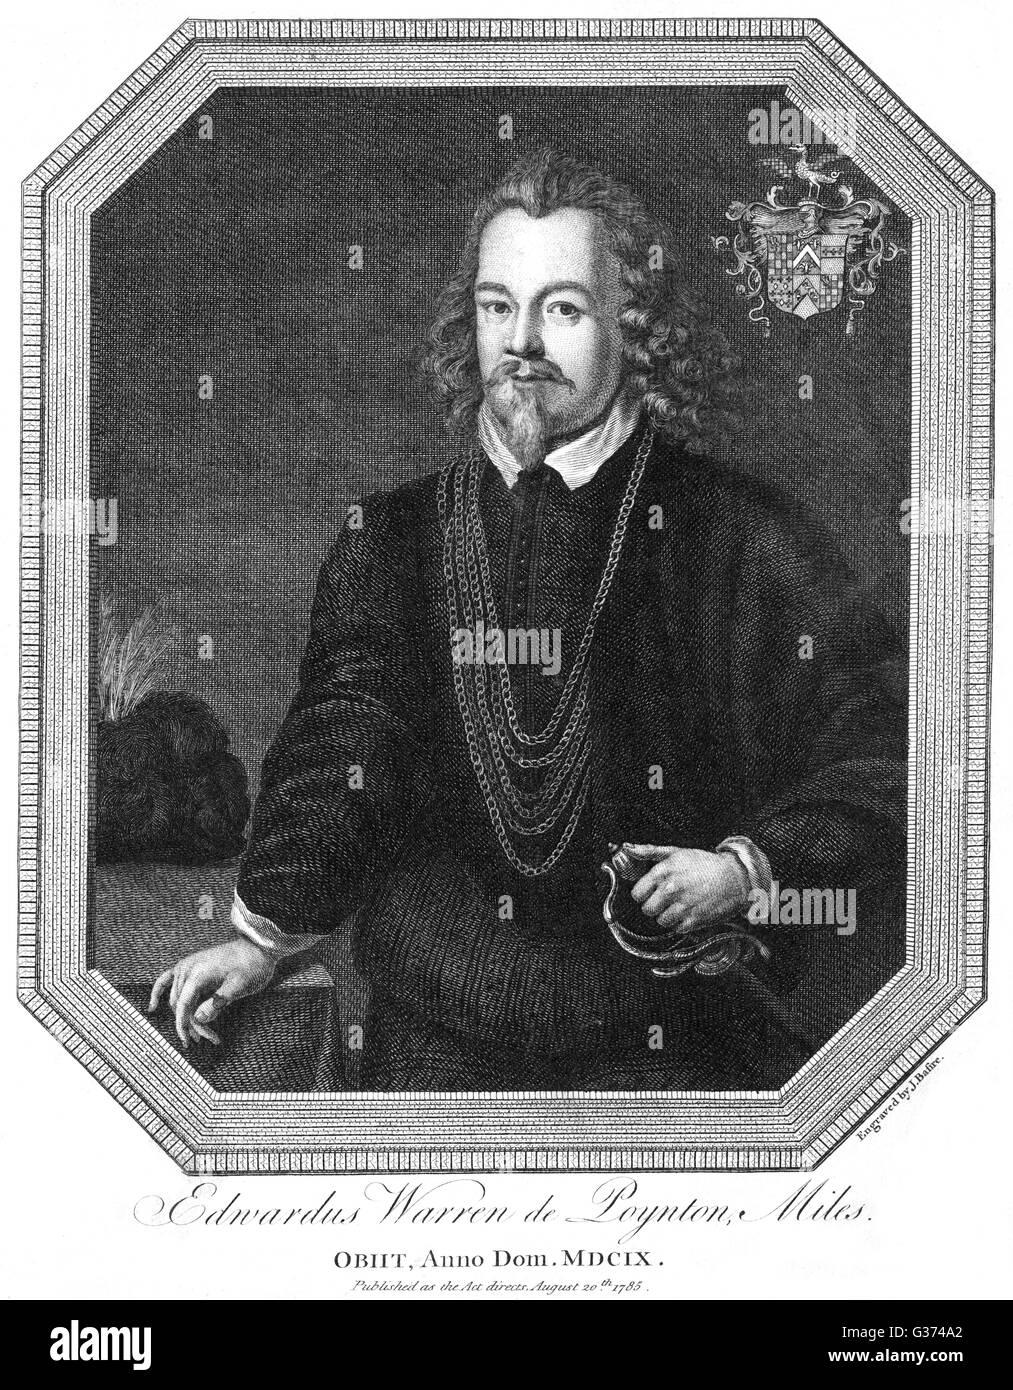 SIR EDWARD WARREN de POYNTON soldier, presumably the son of  Sir John Warren, of whom we  also have a portrait. - Stock Image